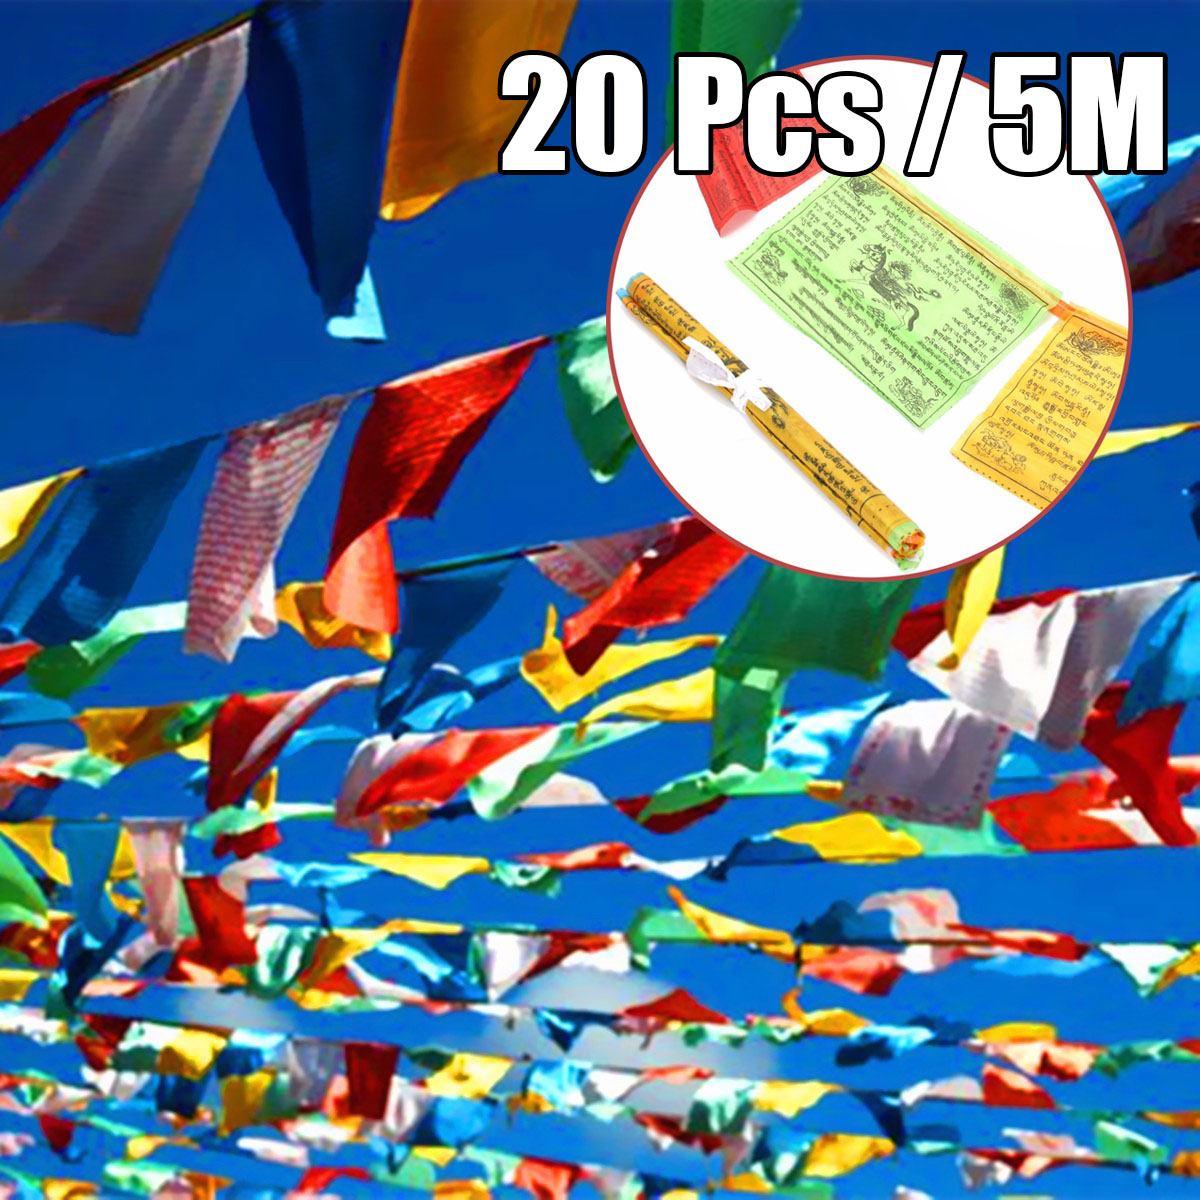 1 Set 20pcs Tibetan Buddhist Prayer Flags 5 Different Colors Polyester Religious Tibet Style Decorative Flag 15x27cm